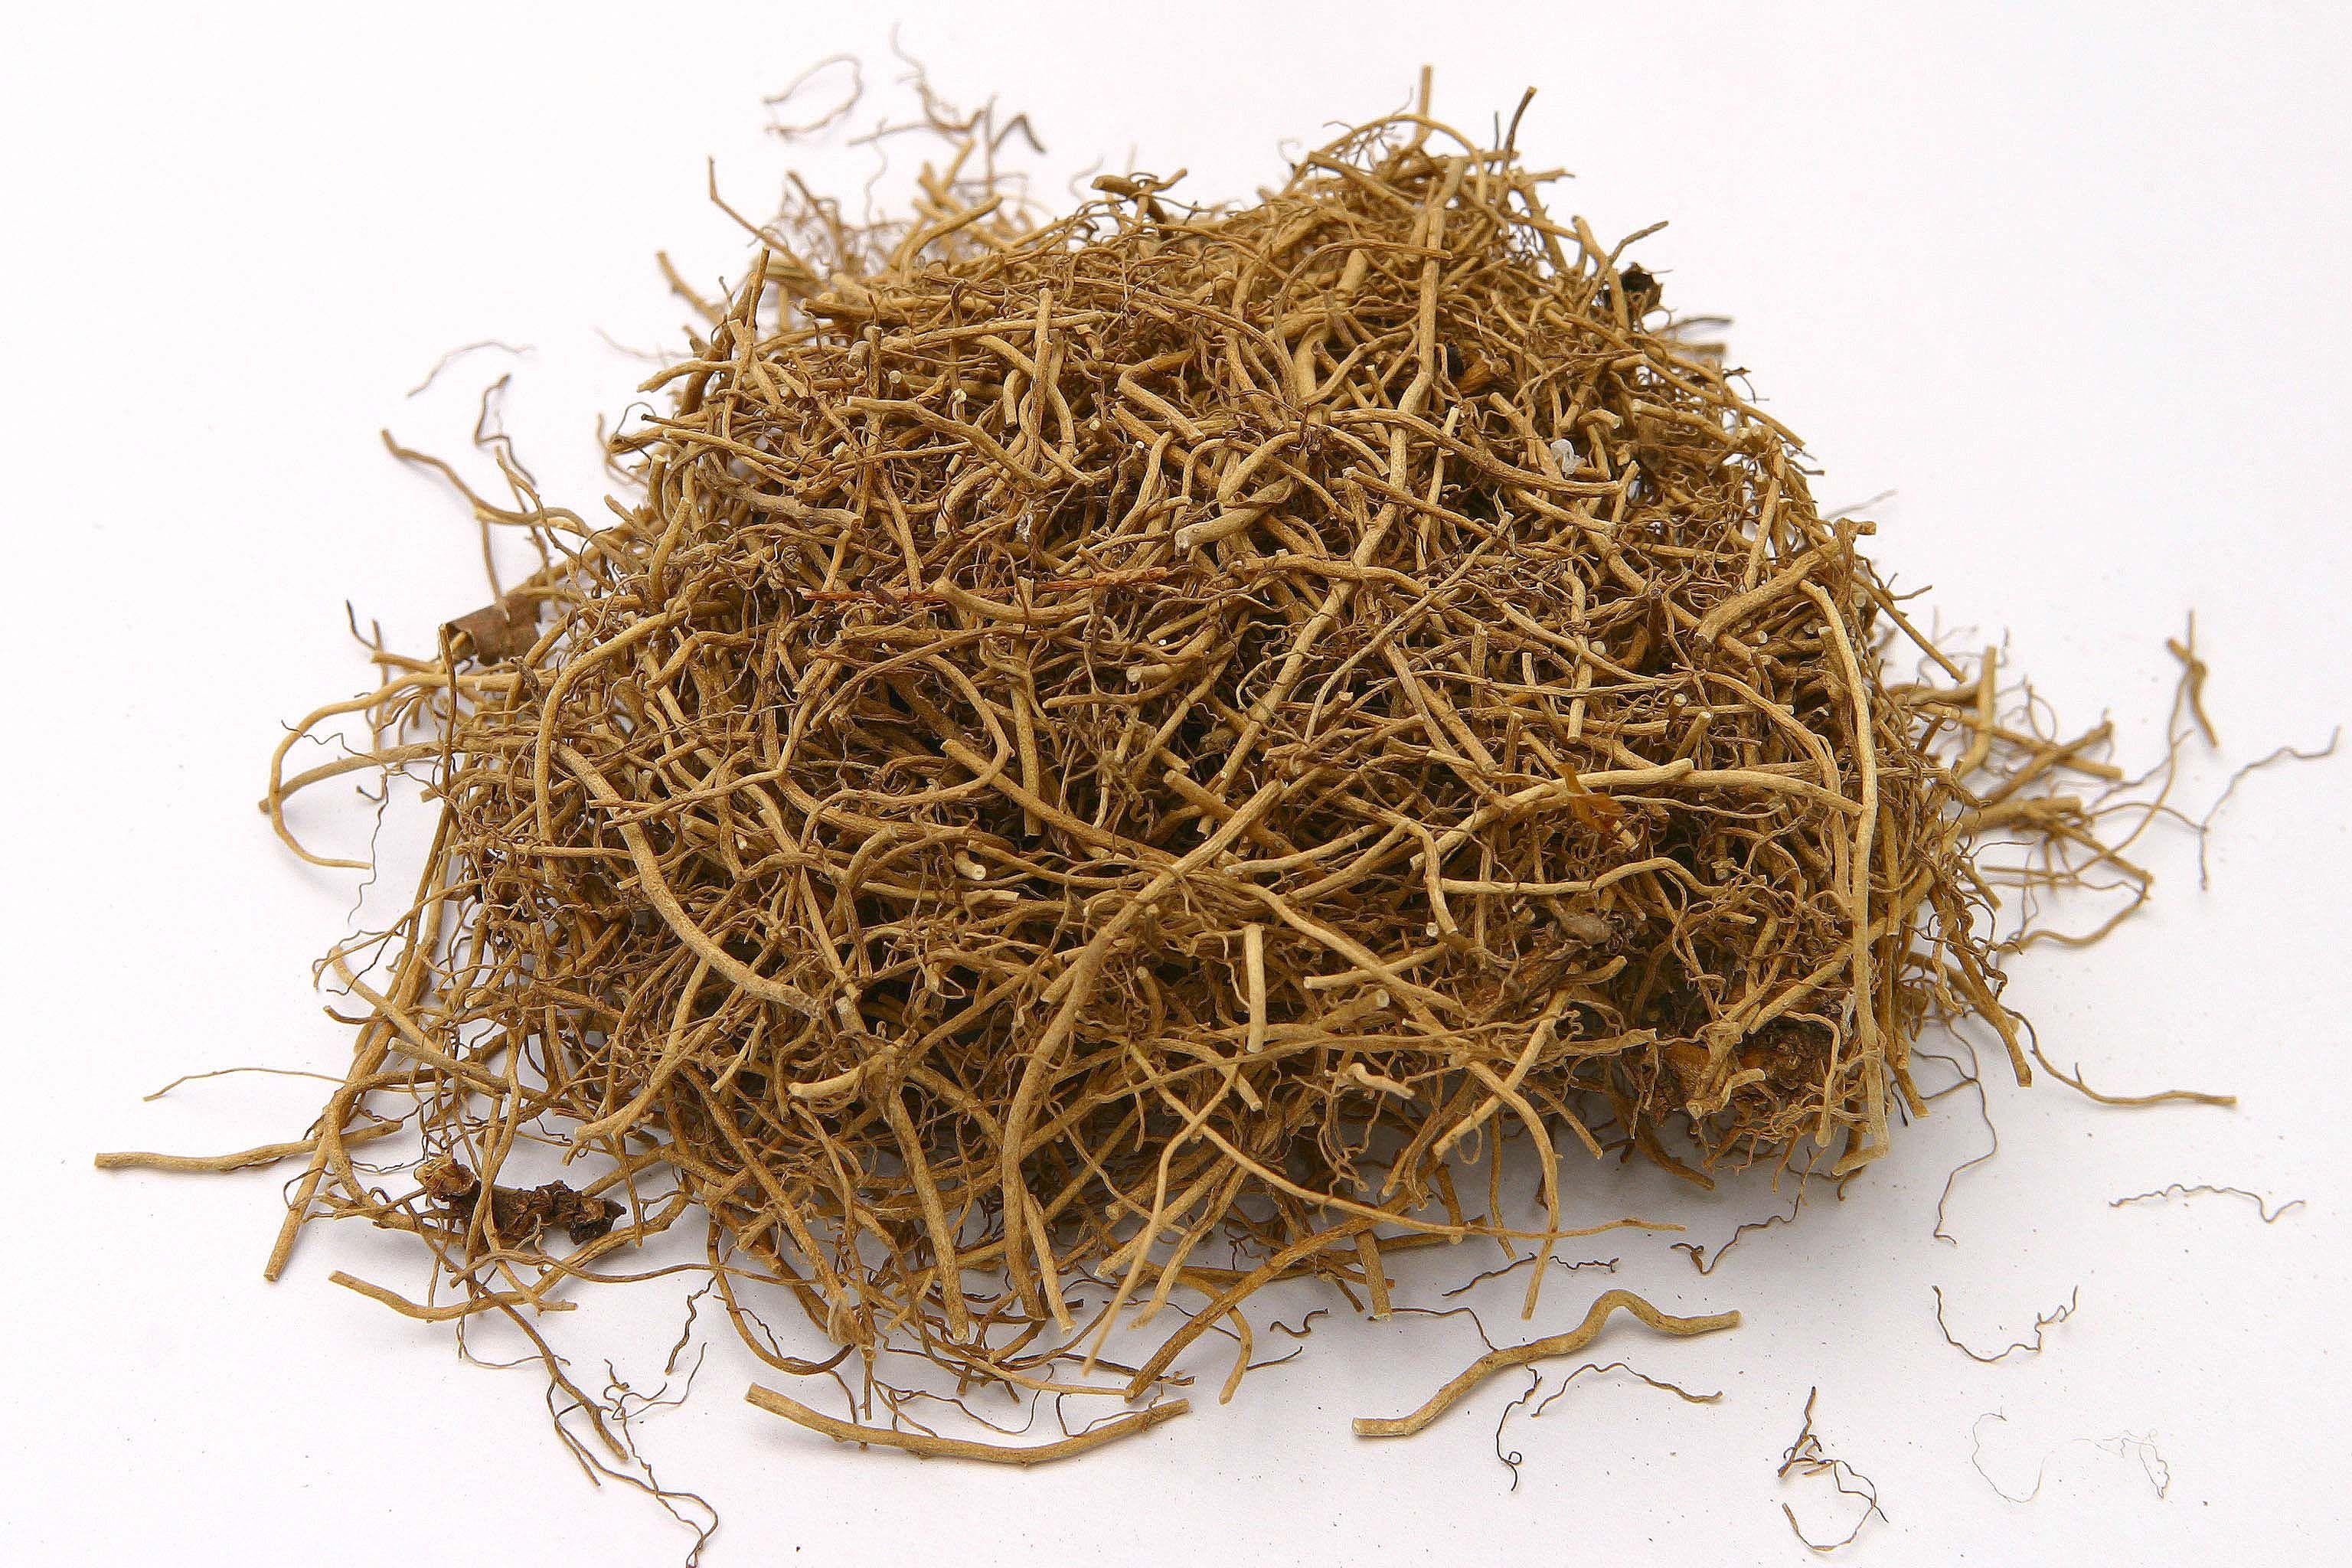 Xi Xin Chinese Wild Ginger Chinese Herbs Herbs Nasal Blockage